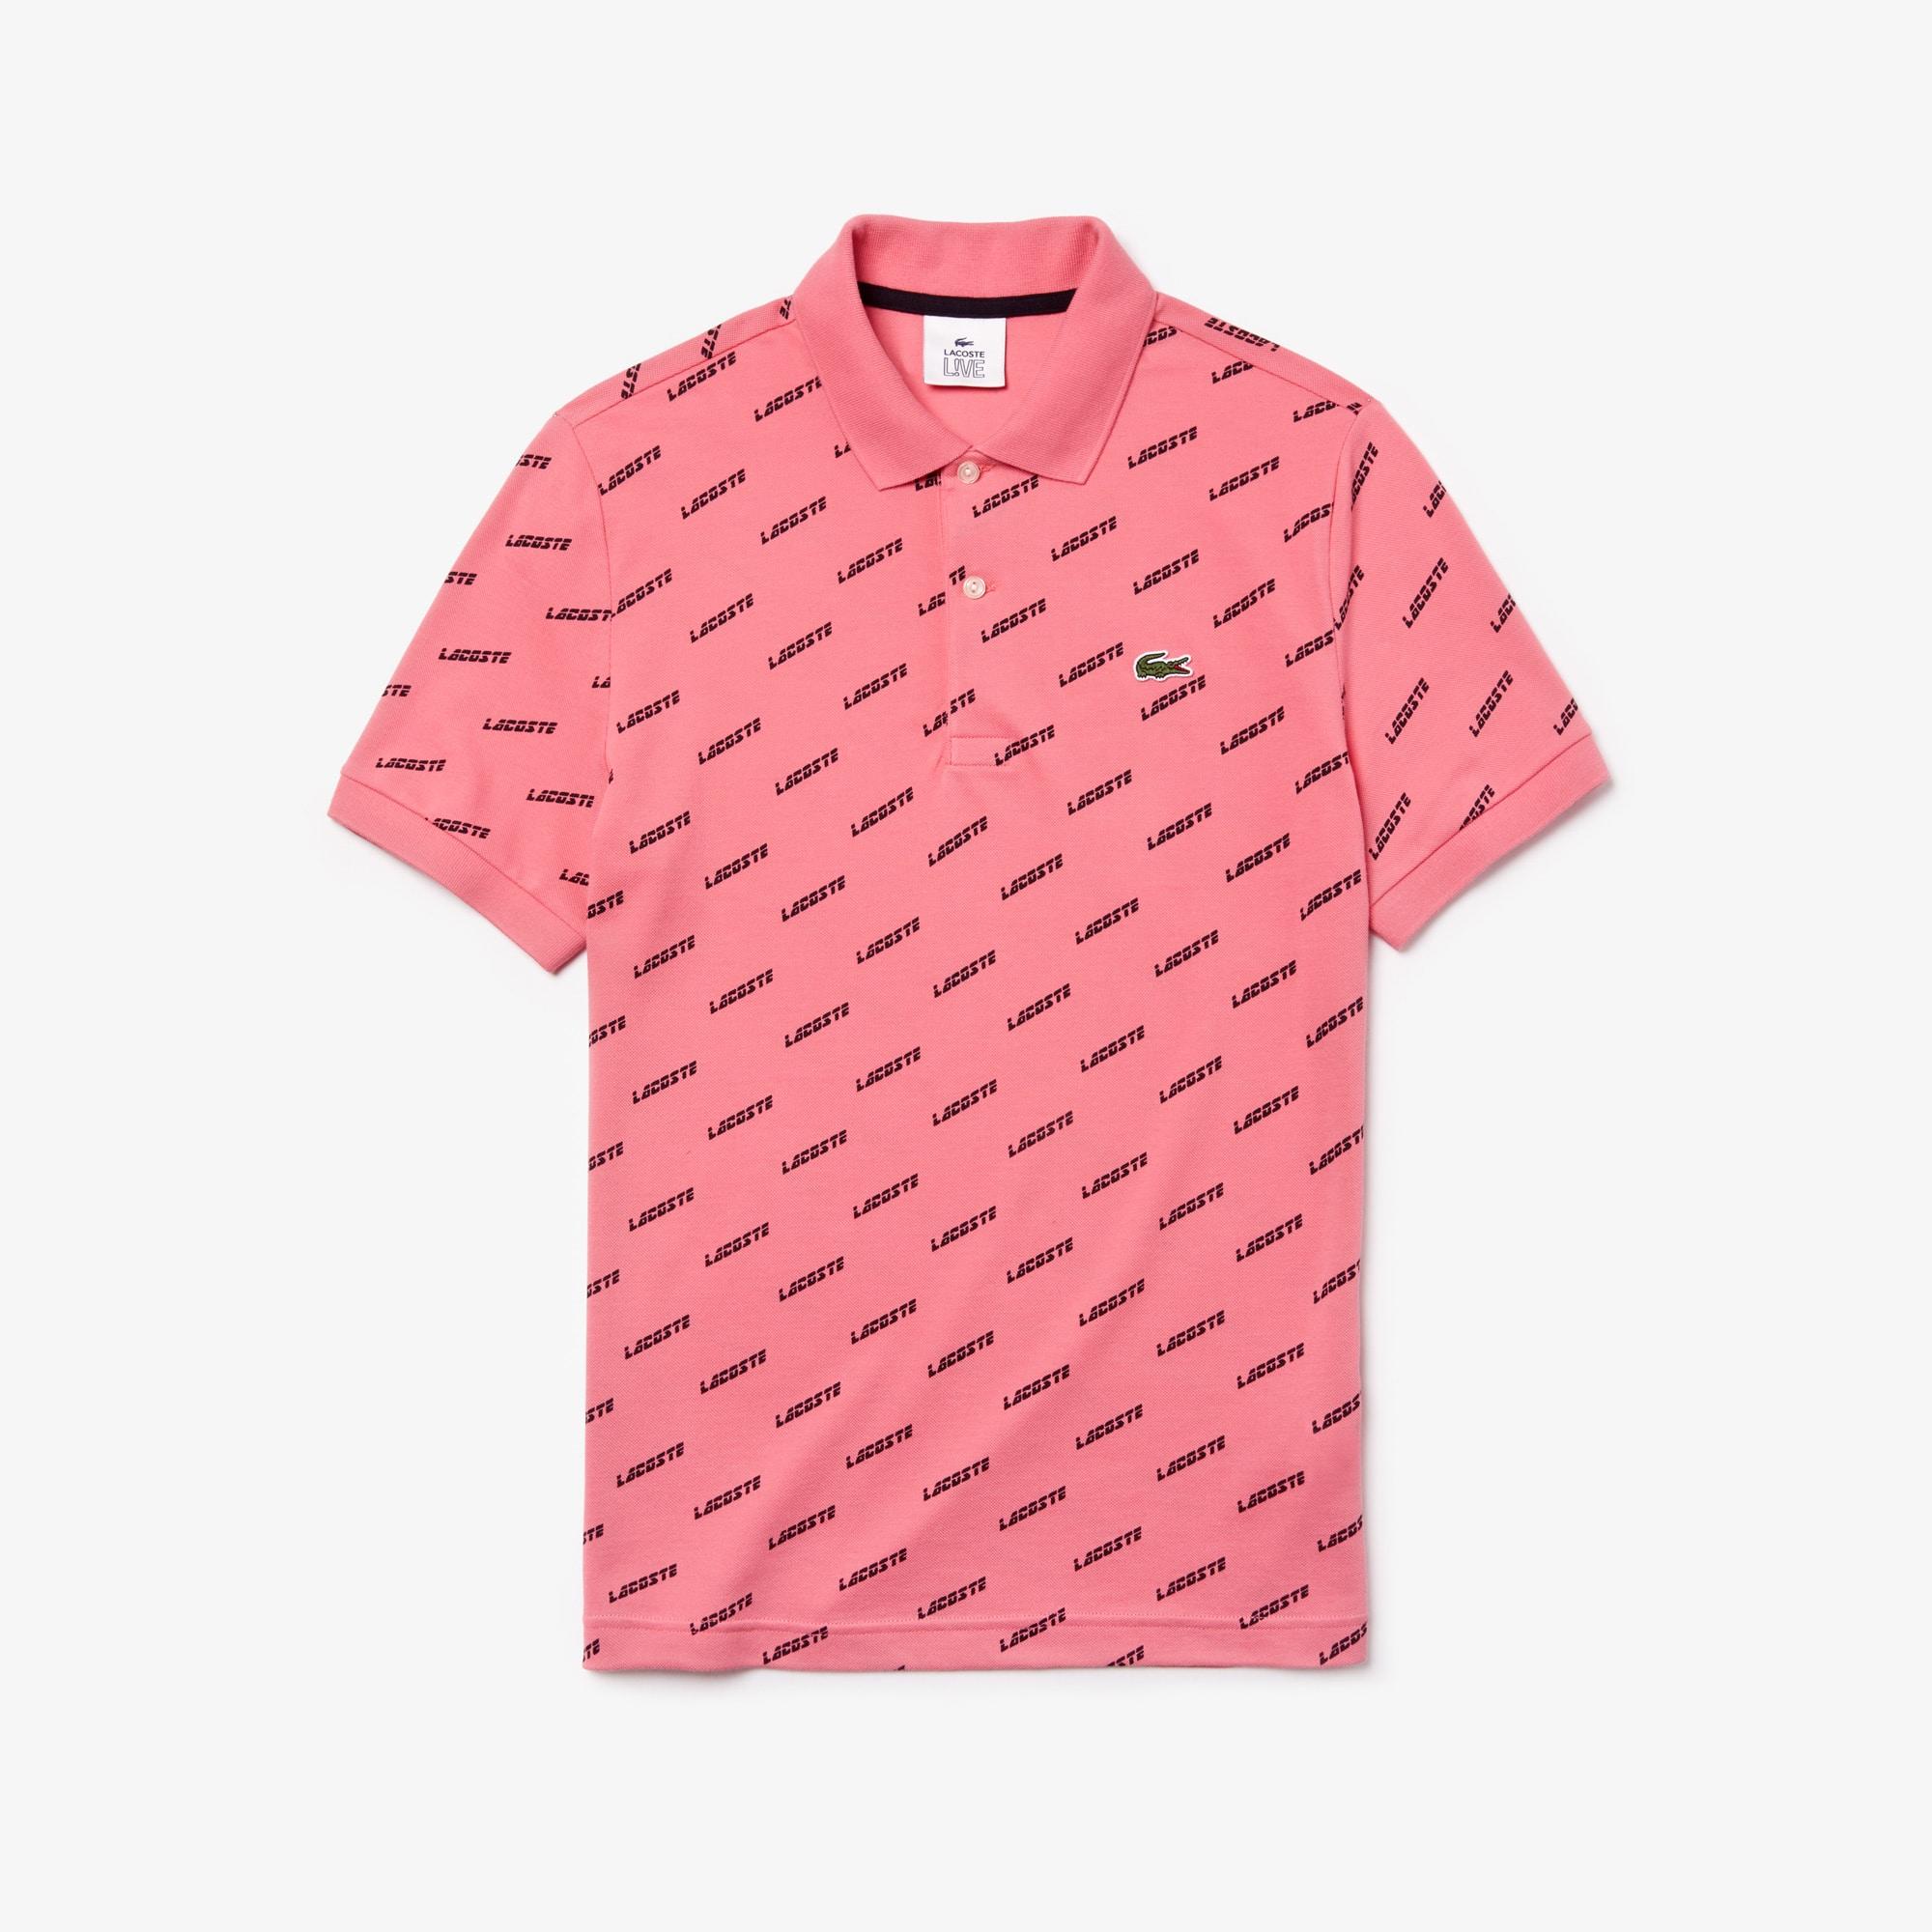 quality design 465c8 34950 Herren Mini Piqué Poloshirt mit Aufdruck LACOSTE L!VE